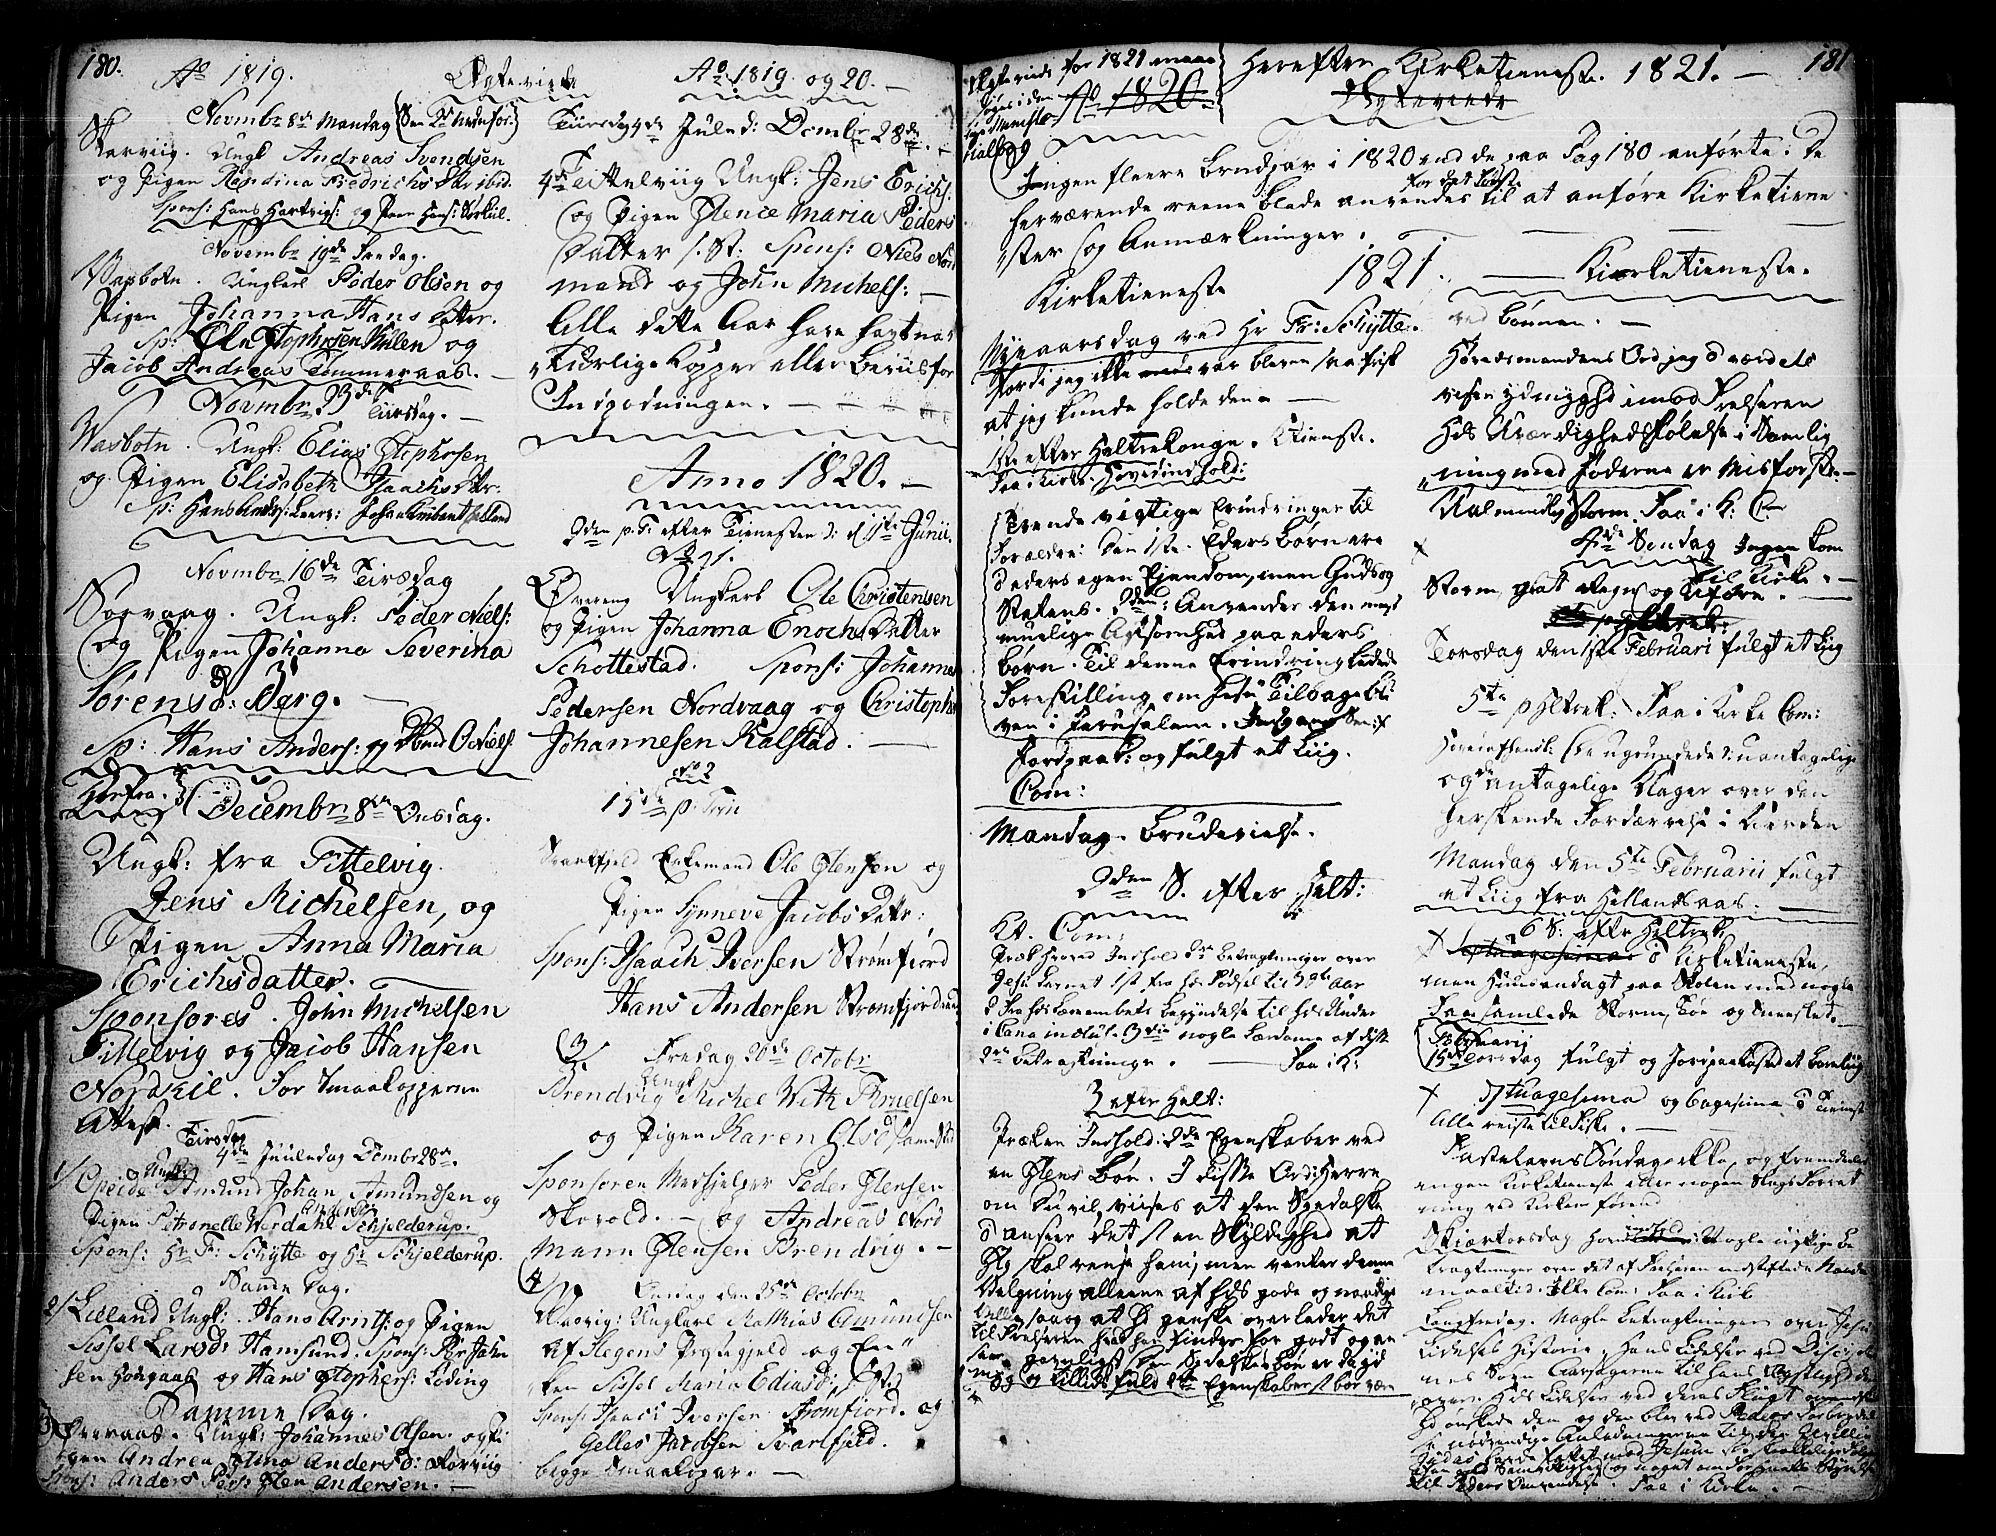 SAT, Ministerialprotokoller, klokkerbøker og fødselsregistre - Nordland, 859/L0841: Ministerialbok nr. 859A01, 1766-1821, s. 180-181